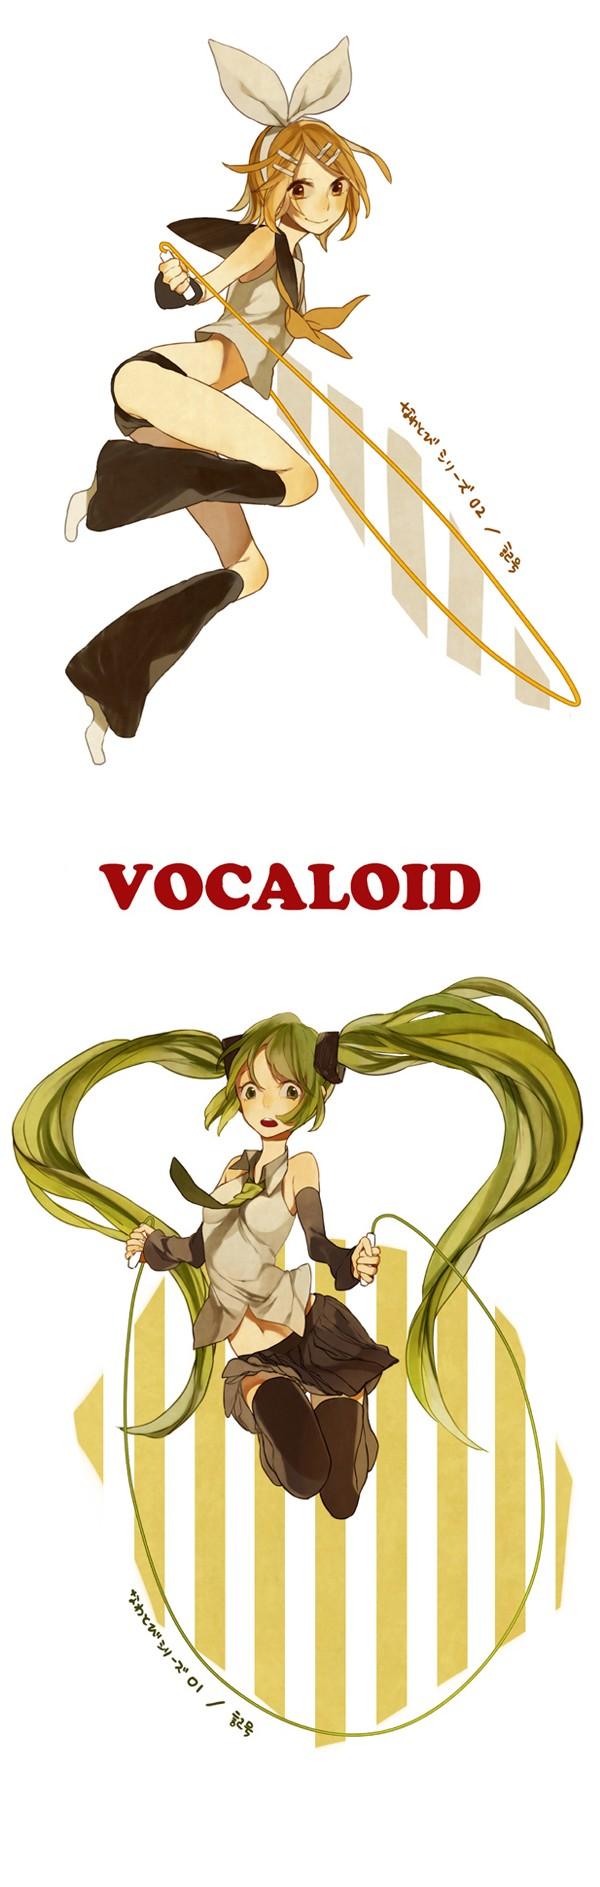 Tags: Anime, VOCALOID, Kagamine Rin, Hatsune Miku, Jump Rope